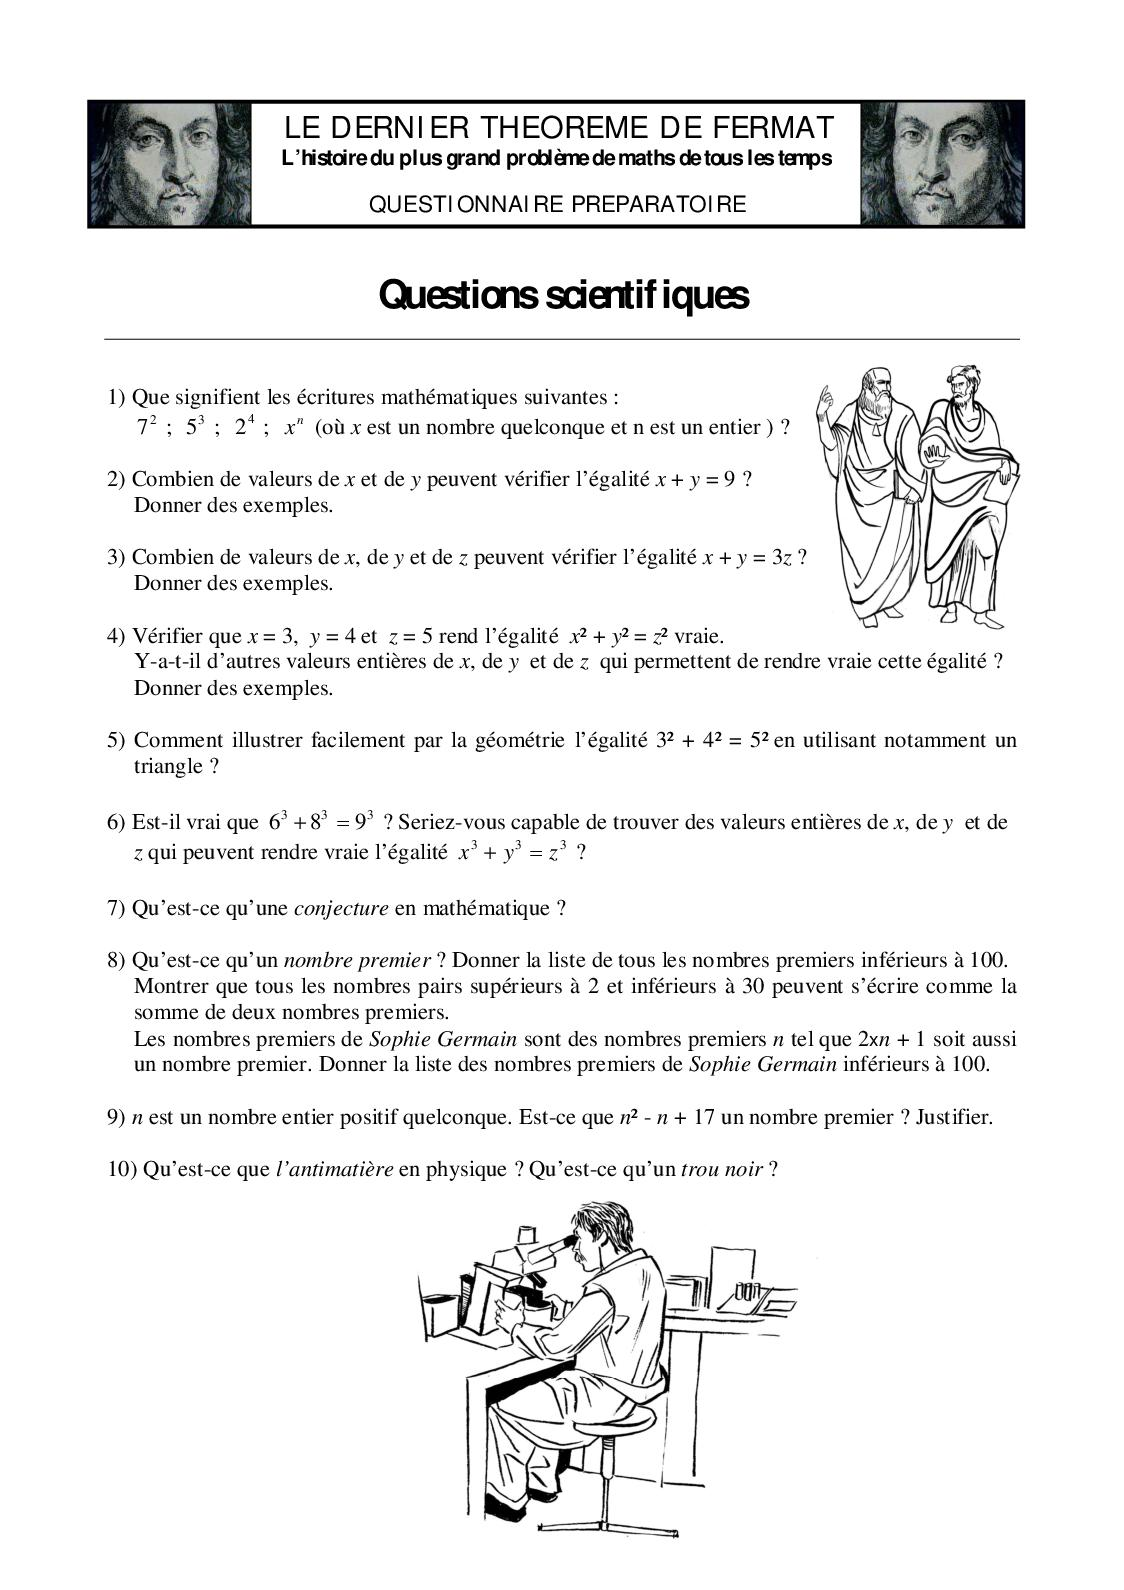 Calameo Document Pr Paratoire Dernier Th Or Me De Ferma Utf 8 B D